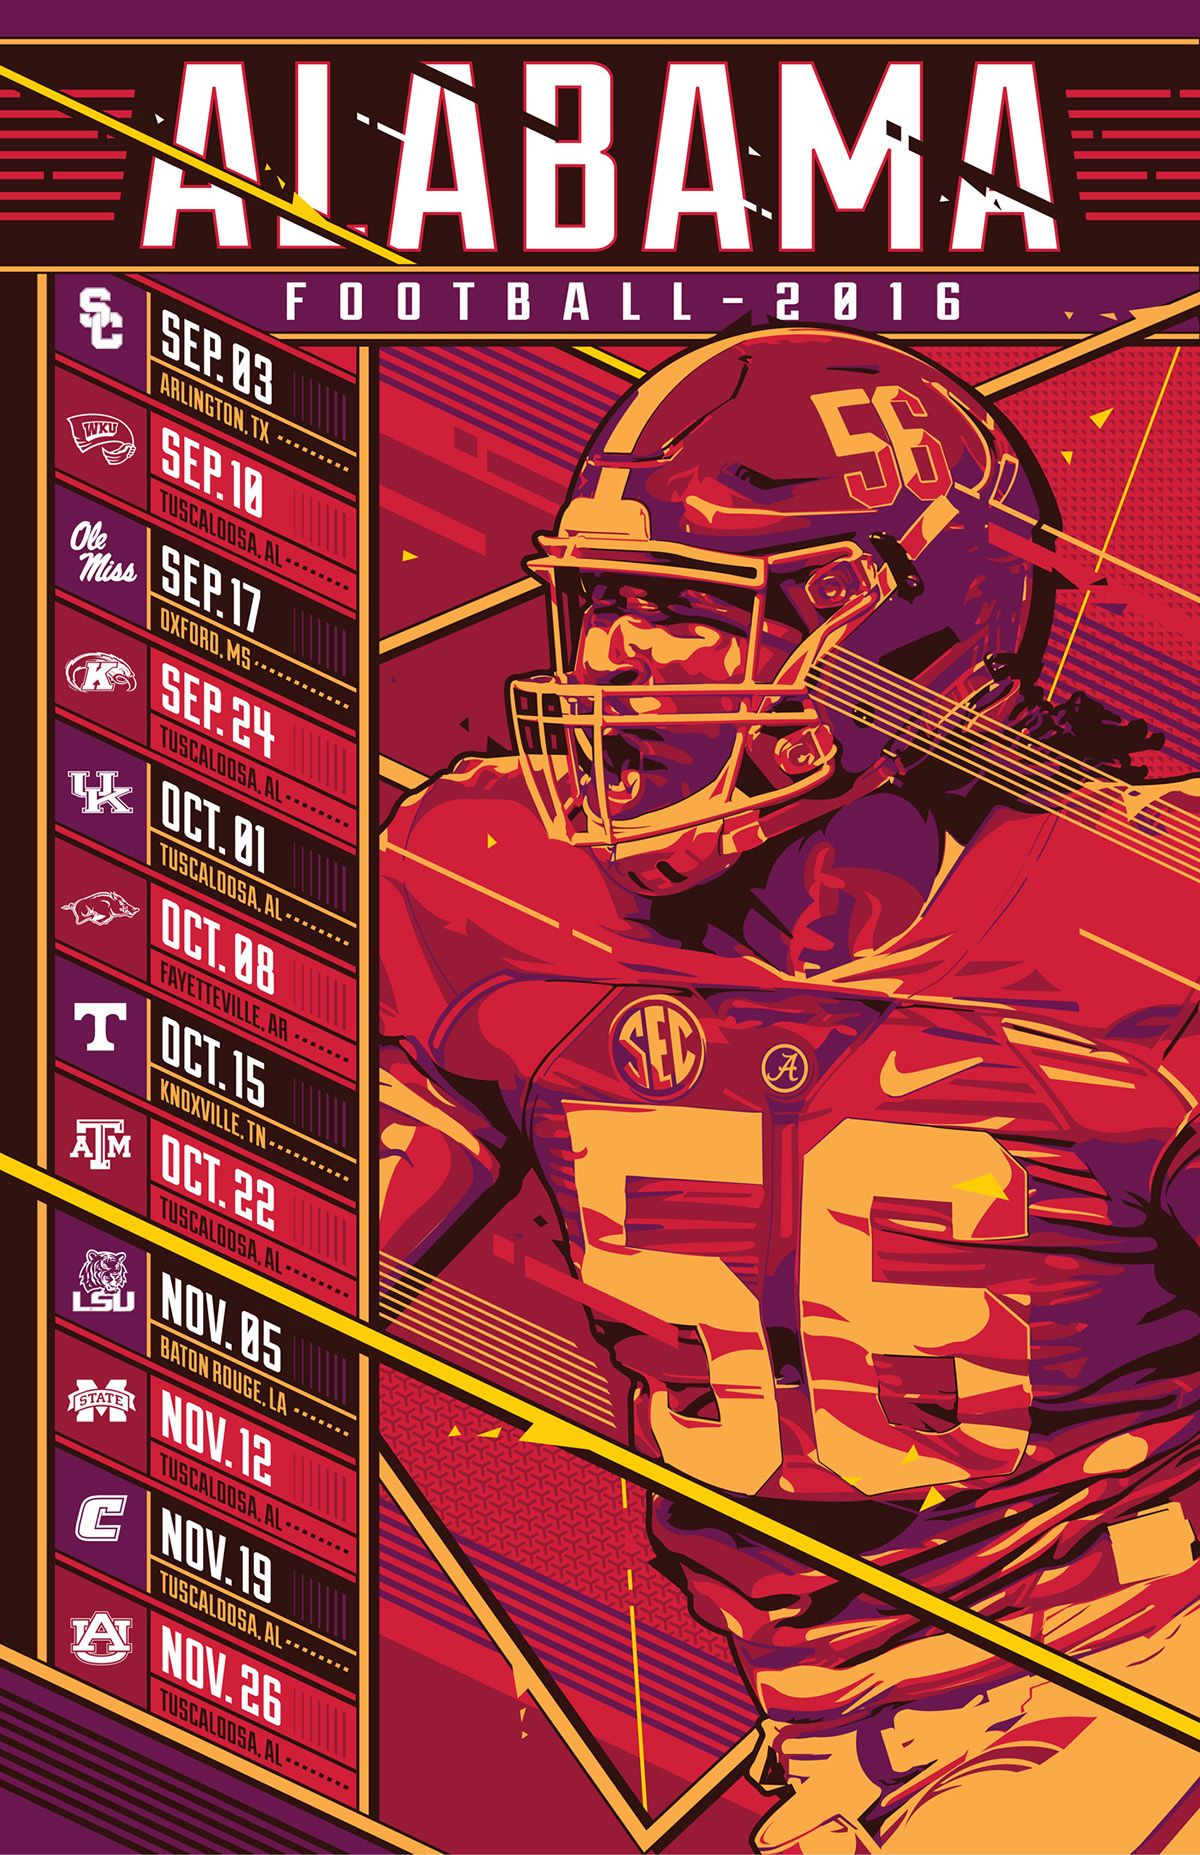 Alabama Football 2016 Schedule On Behance Sports Design